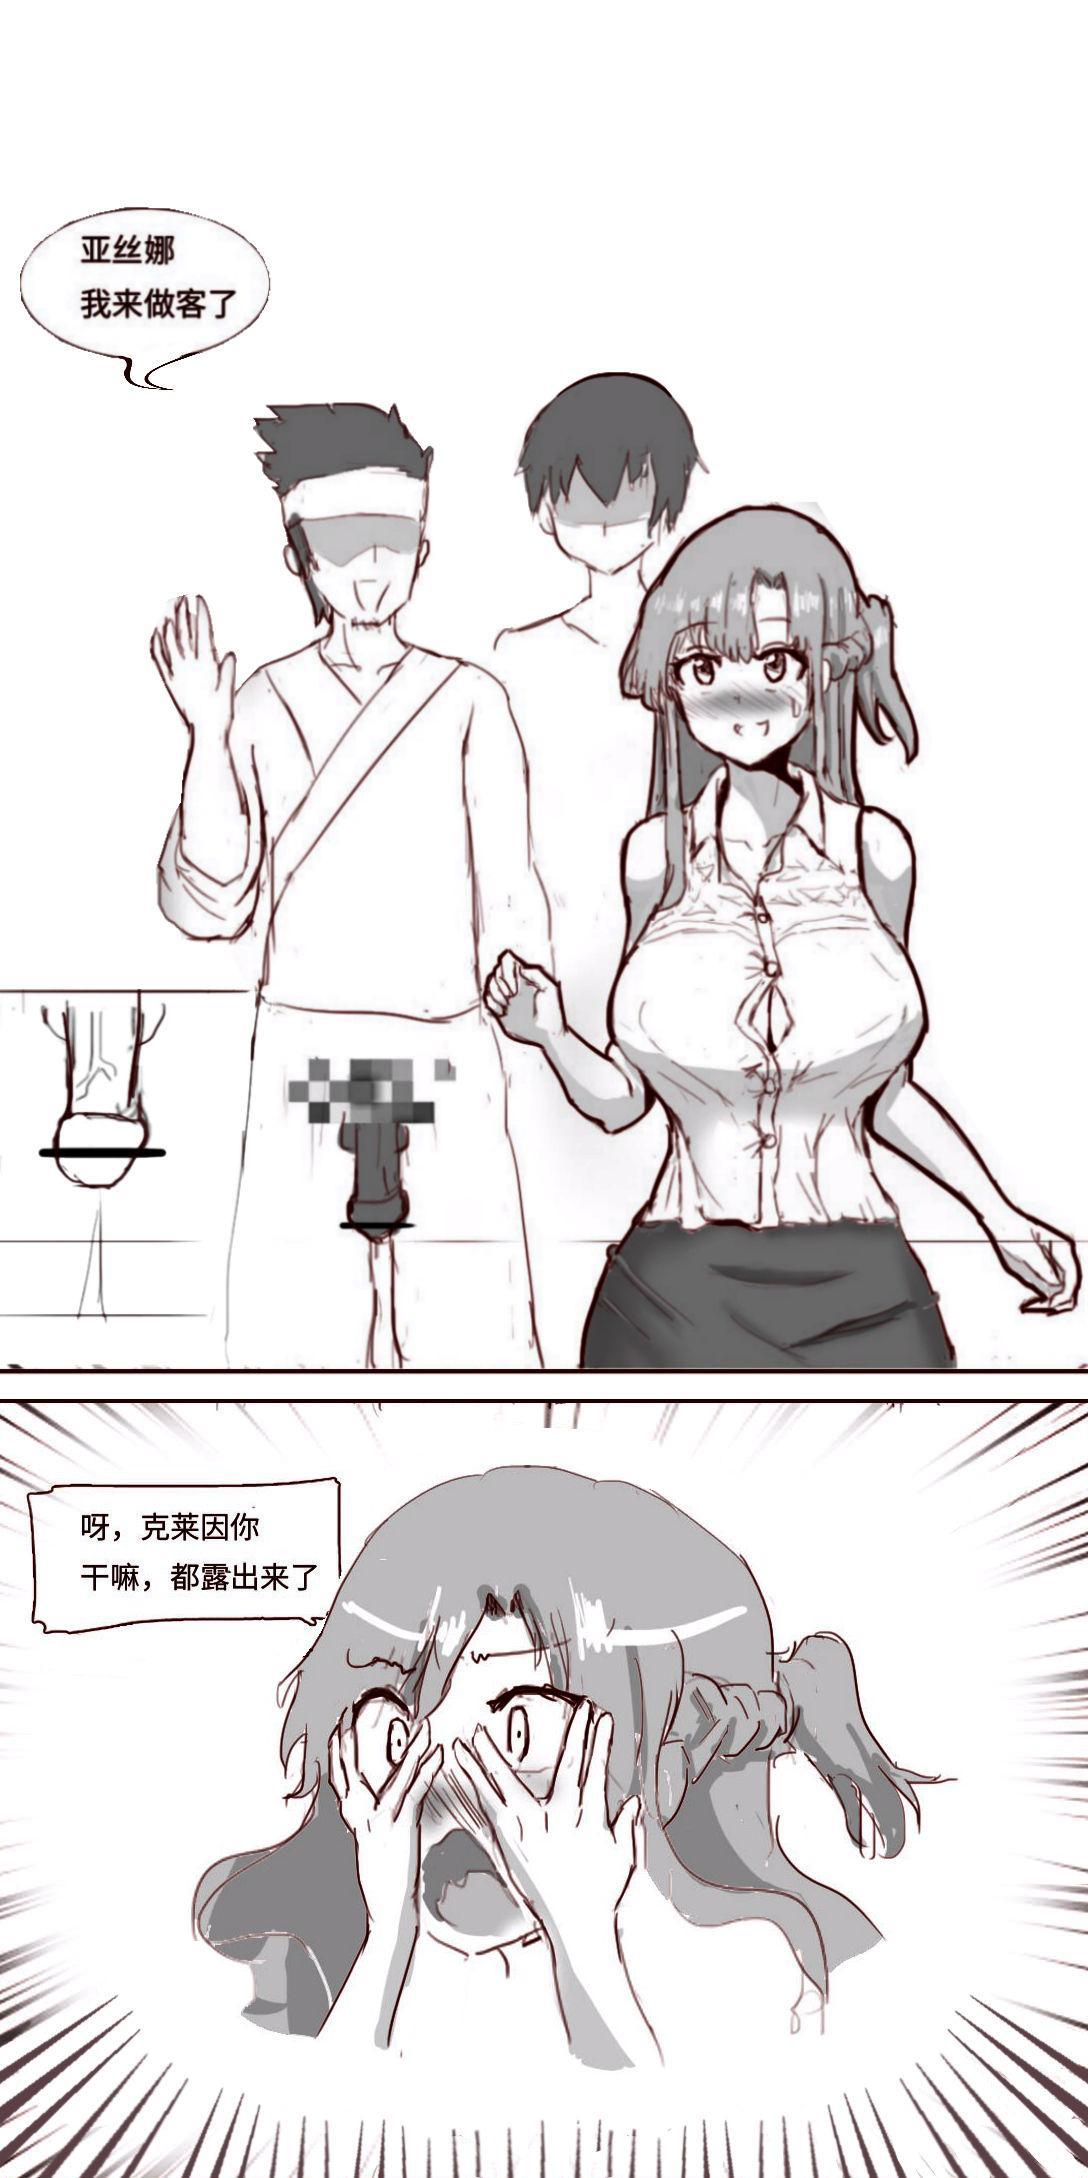 SAO里发生的一个sex bug 0